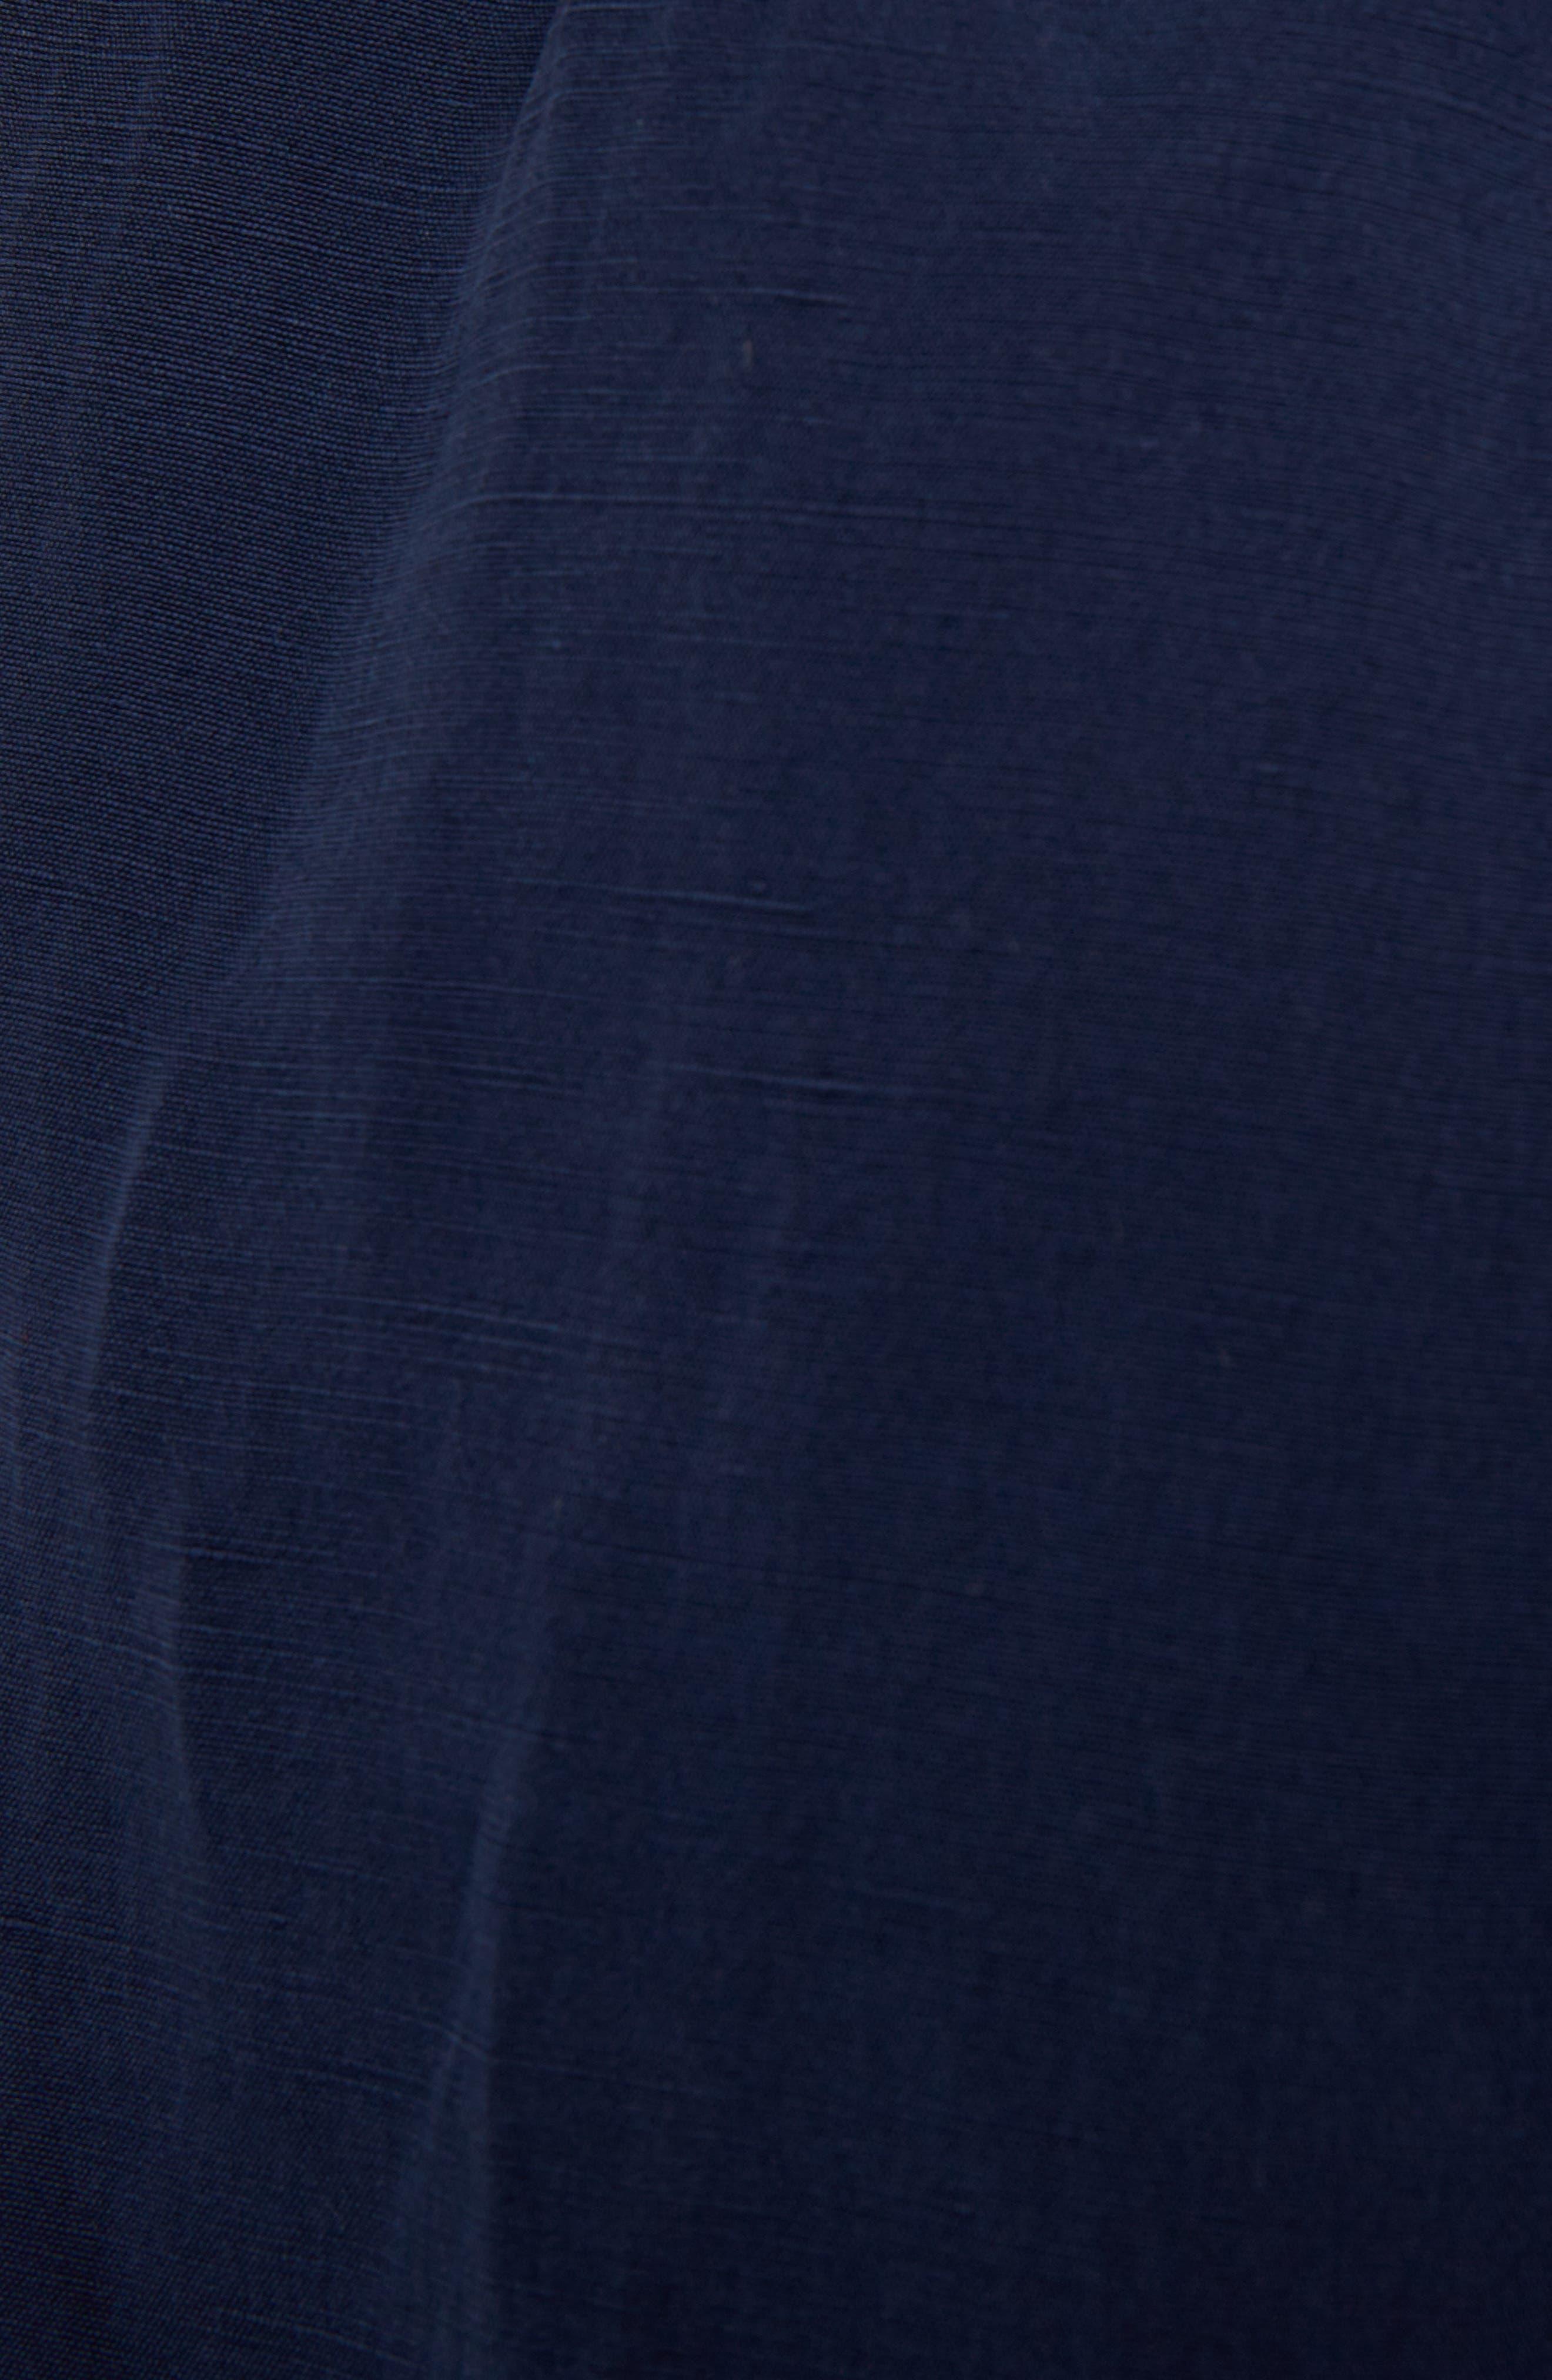 Leather Pocket Linen & Silk Boxer Shorts,                             Alternate thumbnail 8, color,                             Navy